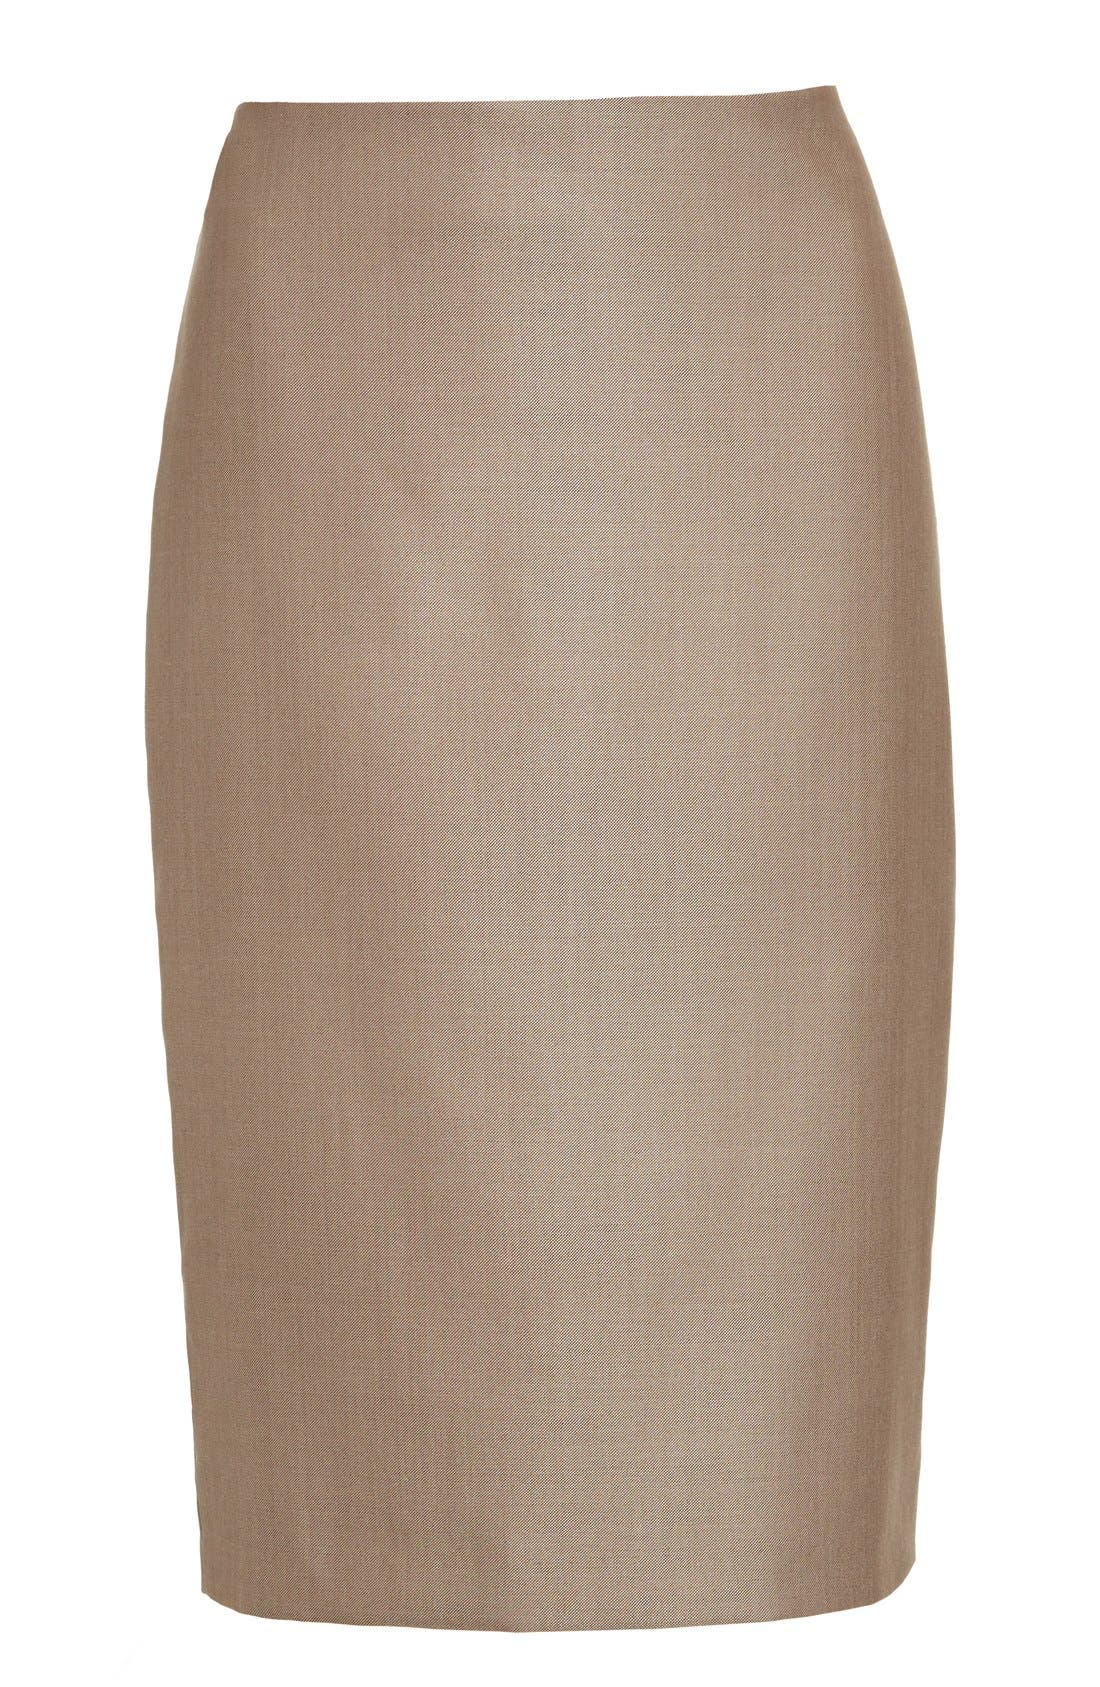 Alternate Image 4  - Max Mara Wool Blend Pencil Skirt